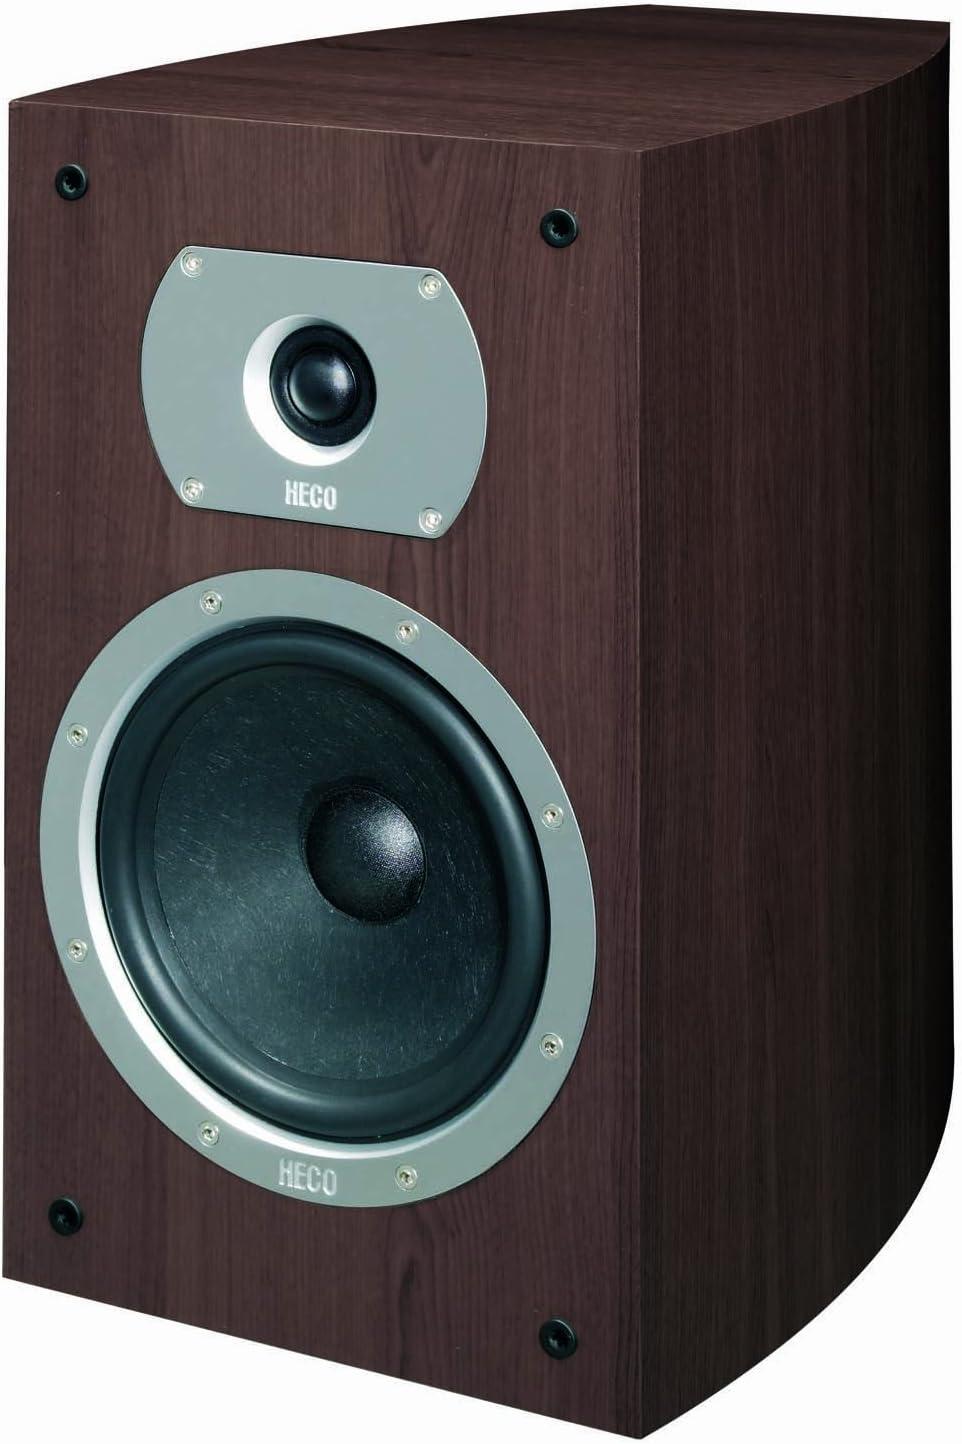 Heco Victa 301 Regallautsprecher Espresso 1 Paar Audio Hifi